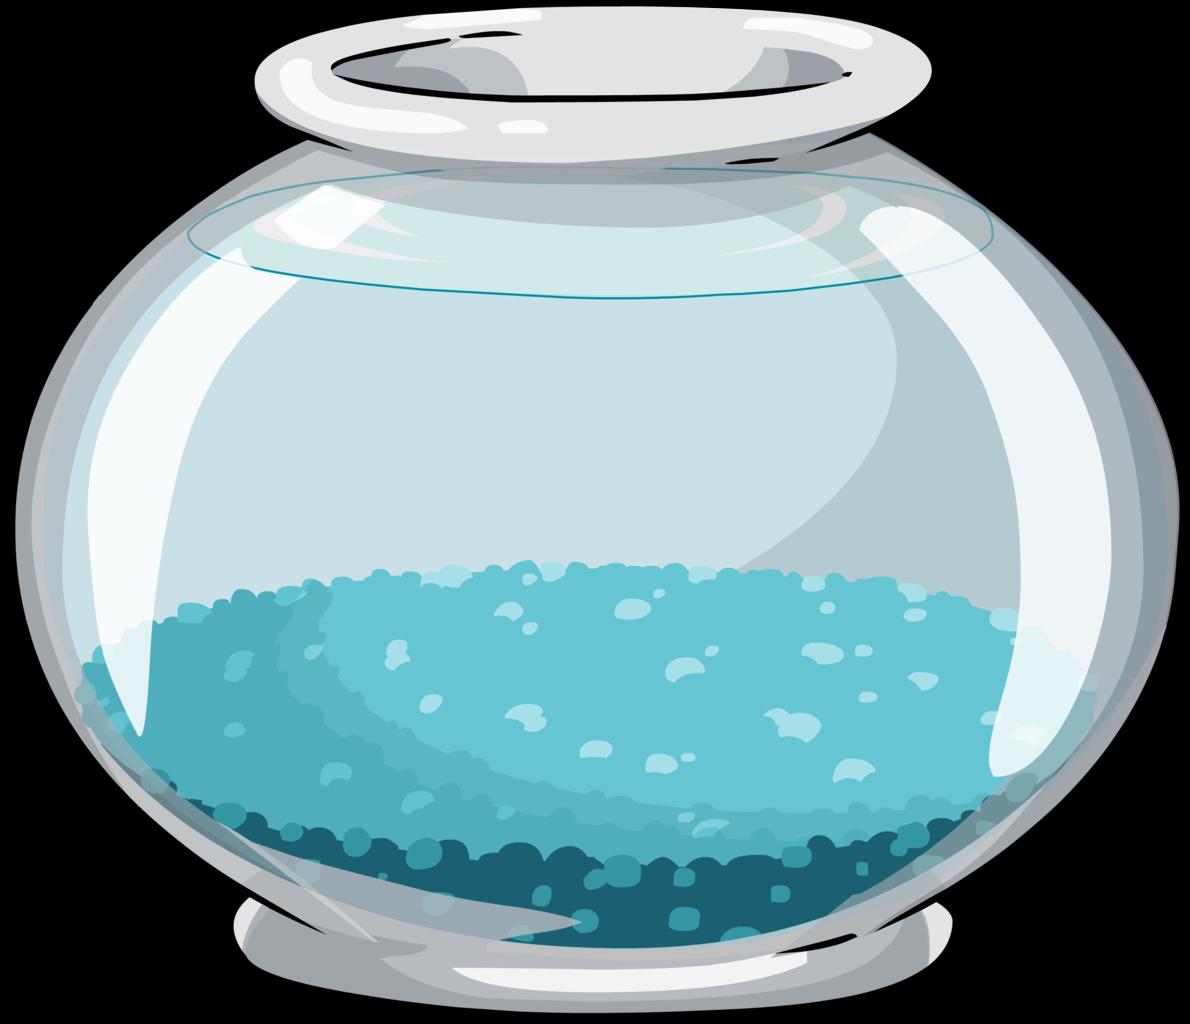 Image fish bowl igloo. Fishbowl clipart transparent